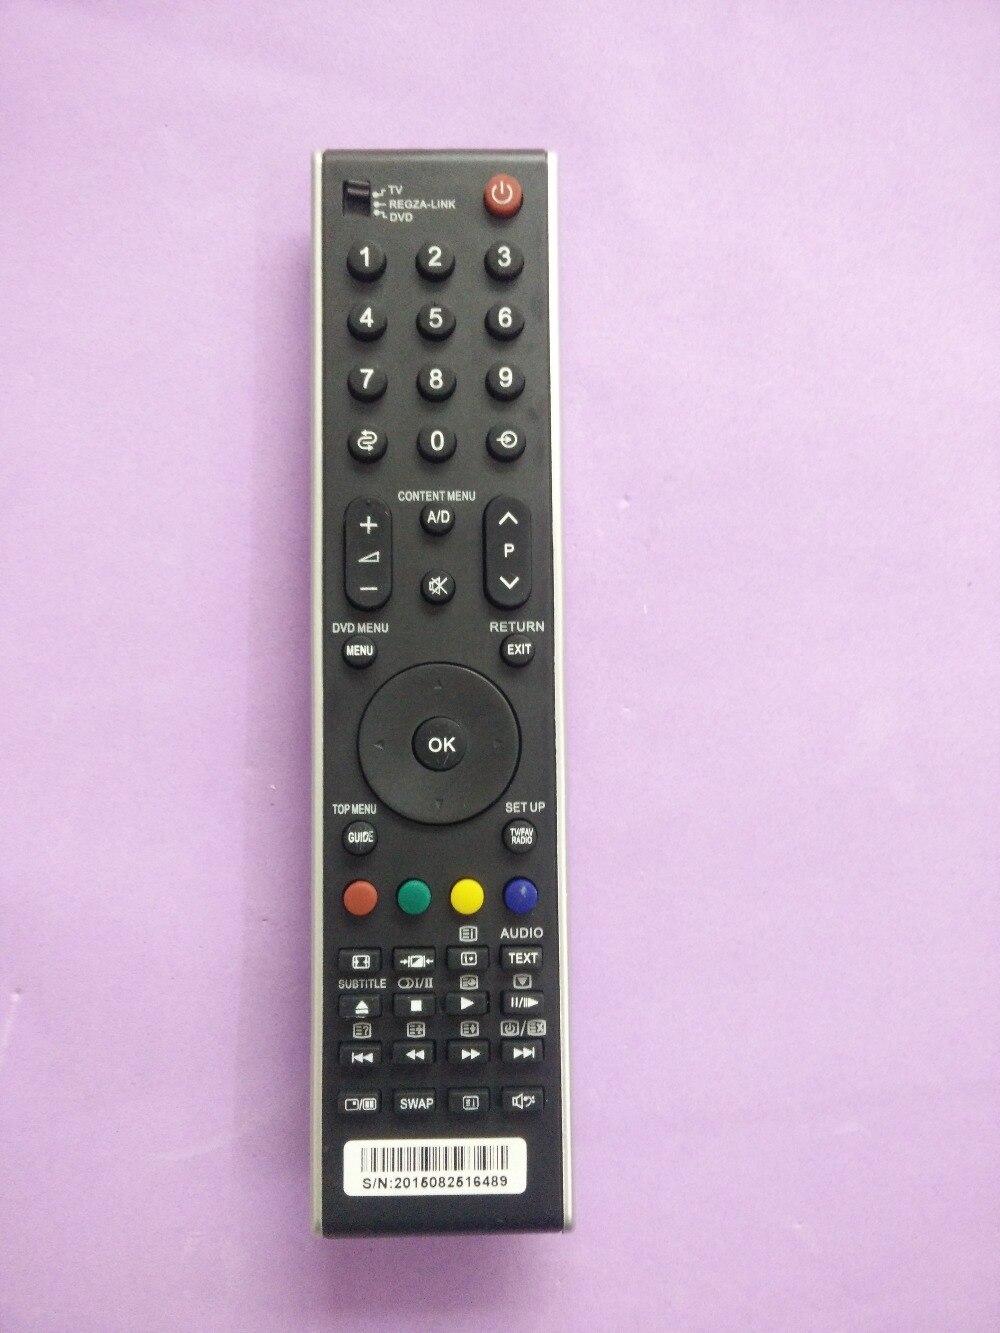 Tv remote control for toshiba ct 90465 ct 90462 ct 8054 ct 90420.